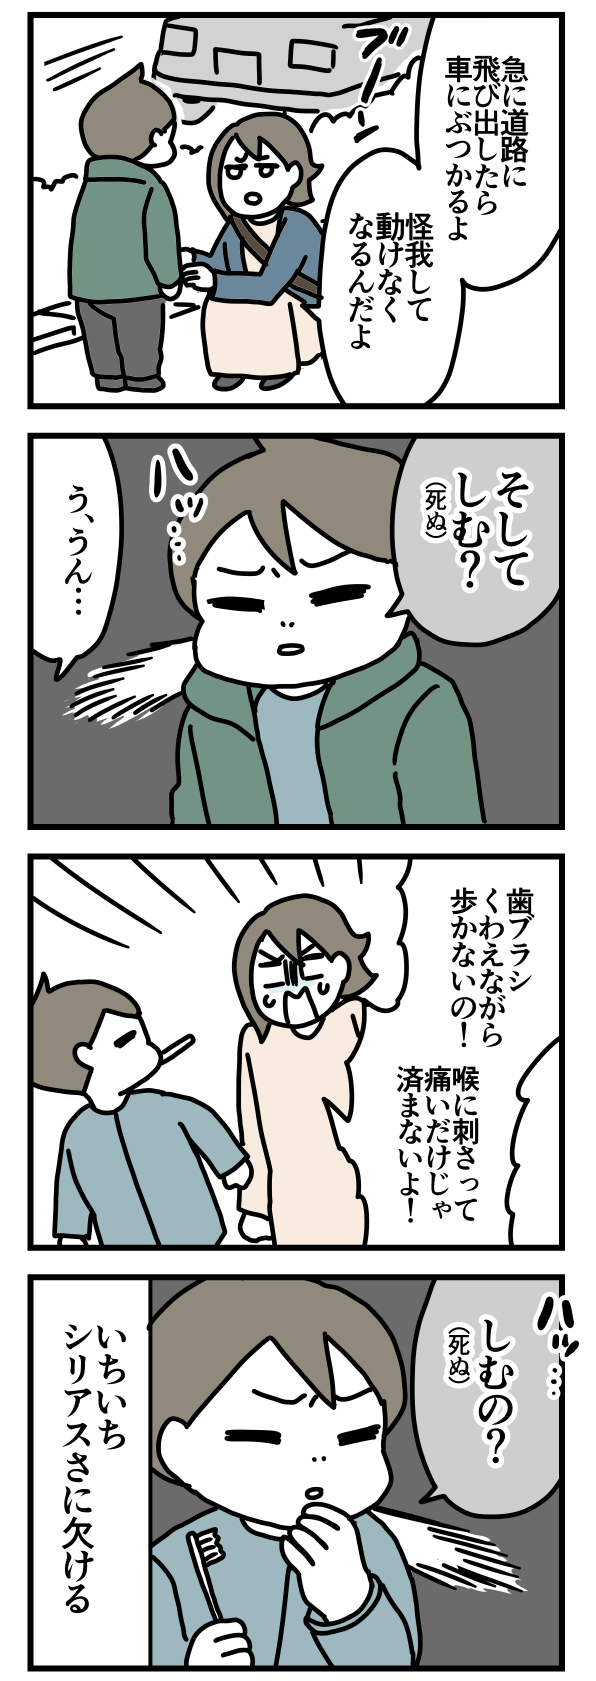 f:id:kanemotonomukuu:20171002153217j:plain